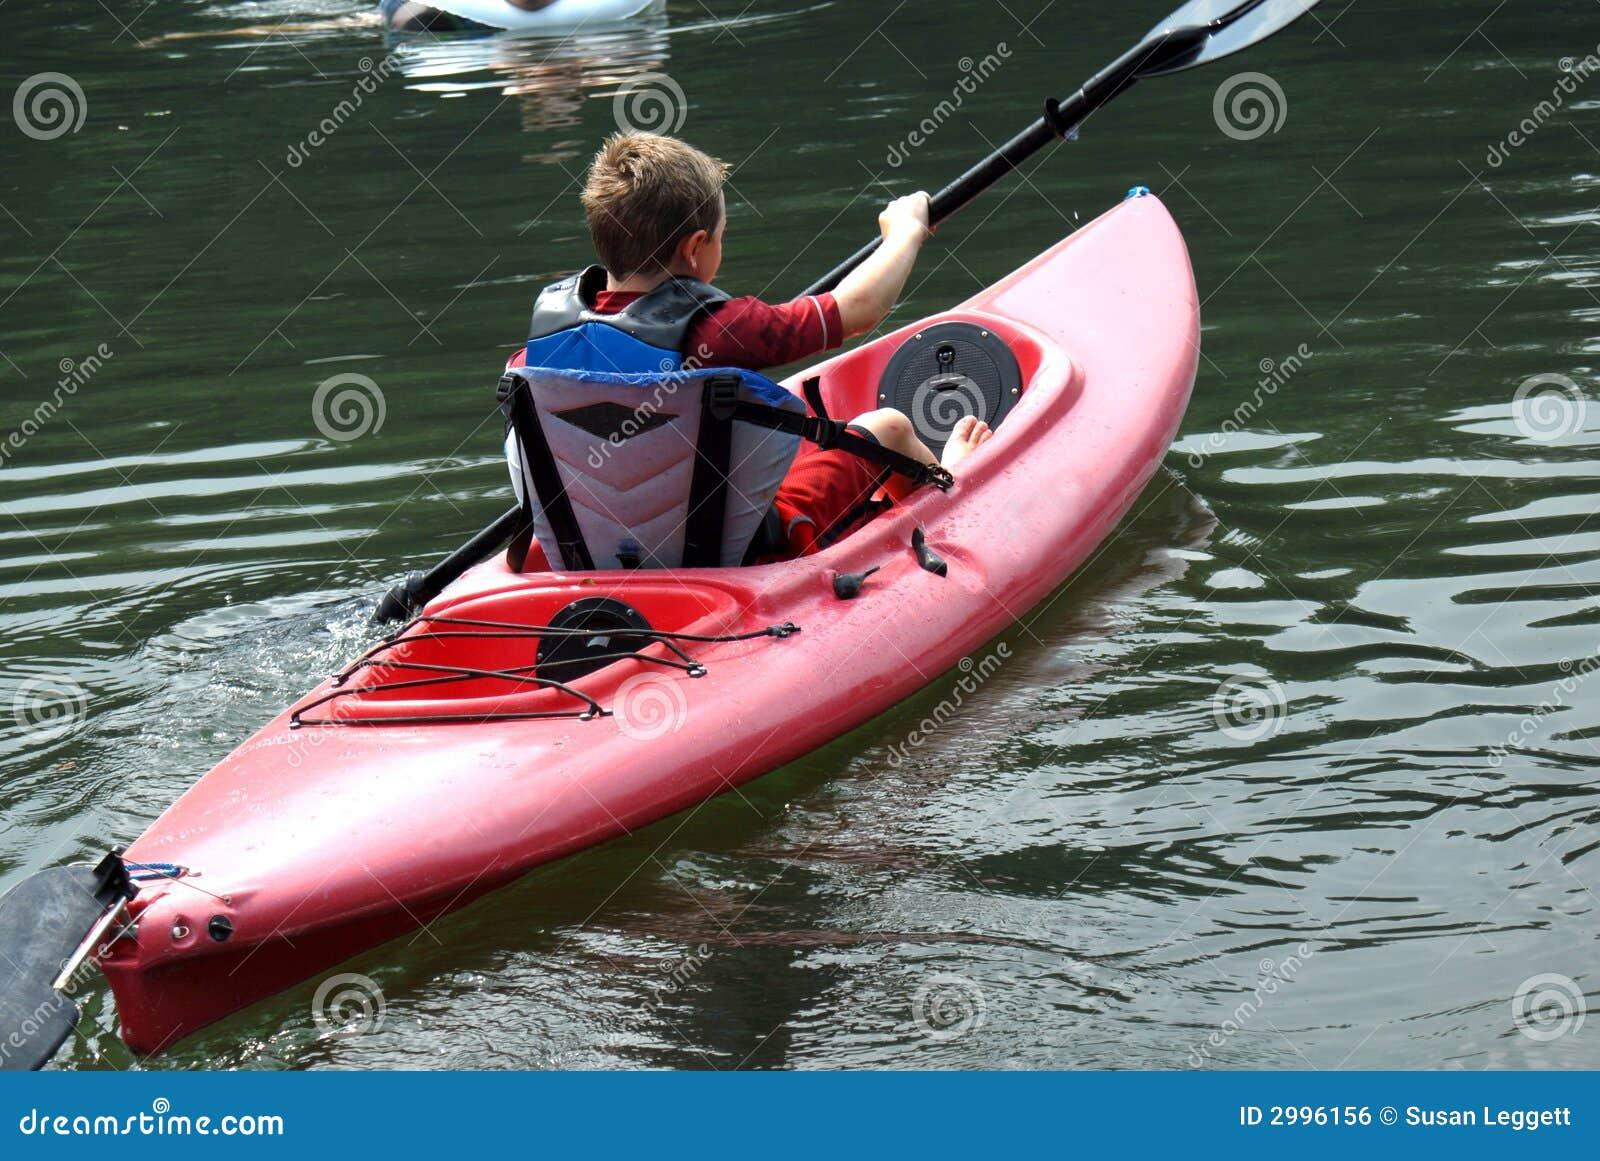 Paddle The Boat Royalty Free Stock Image Image 2996156